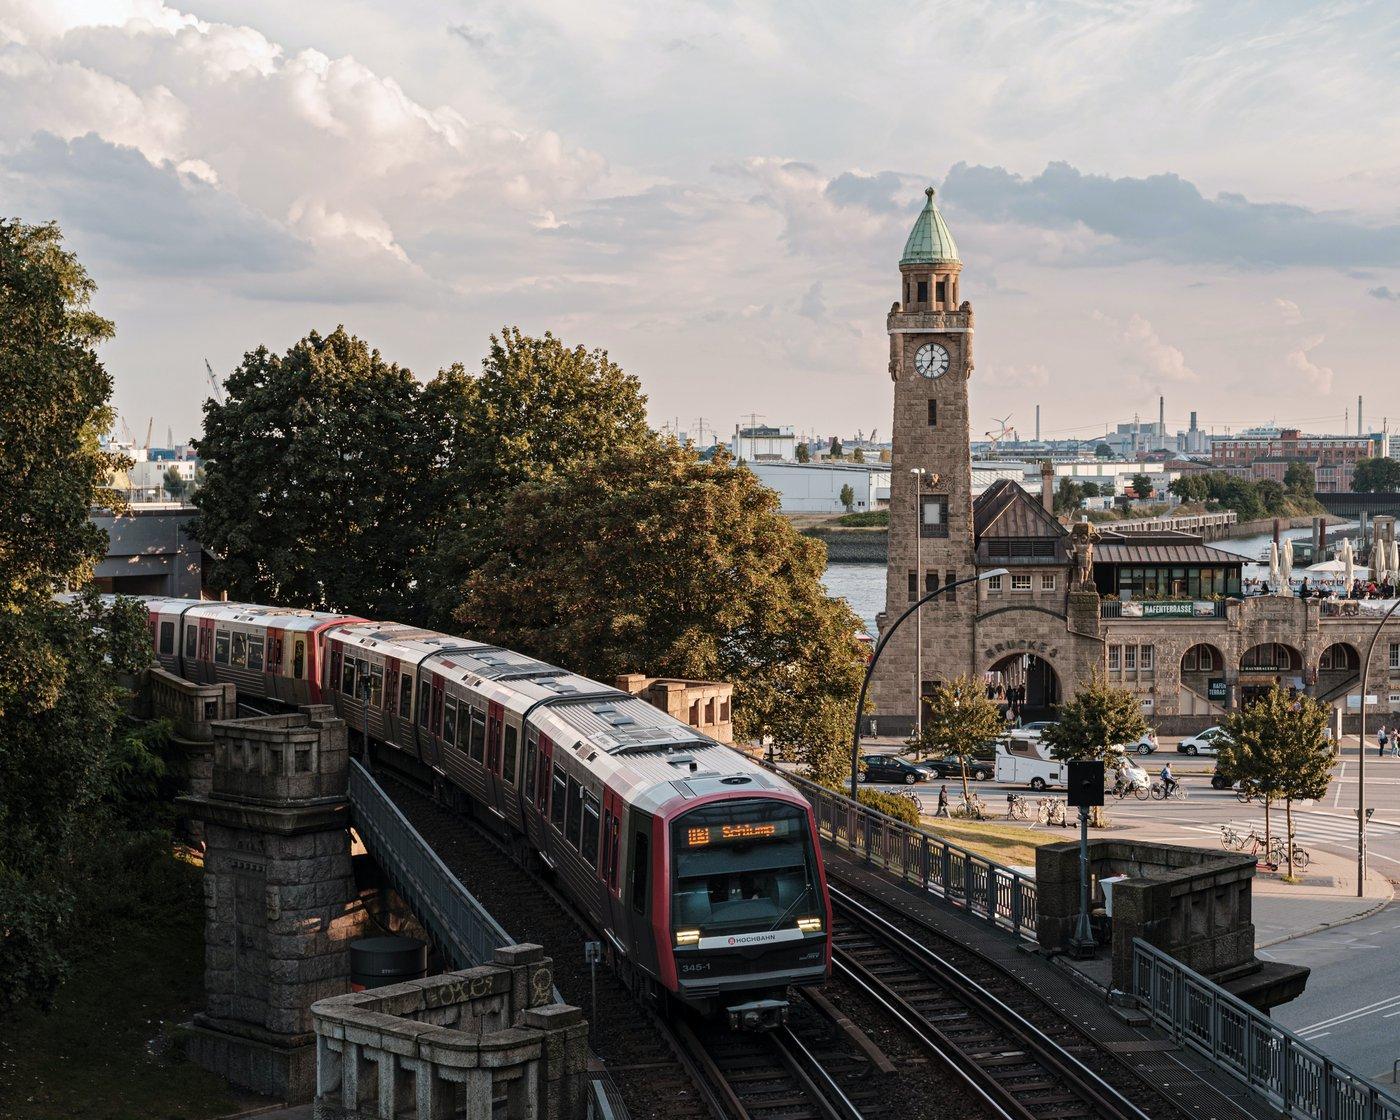 Landungsbruecke clock tower and the hochbahn train in Hamburg